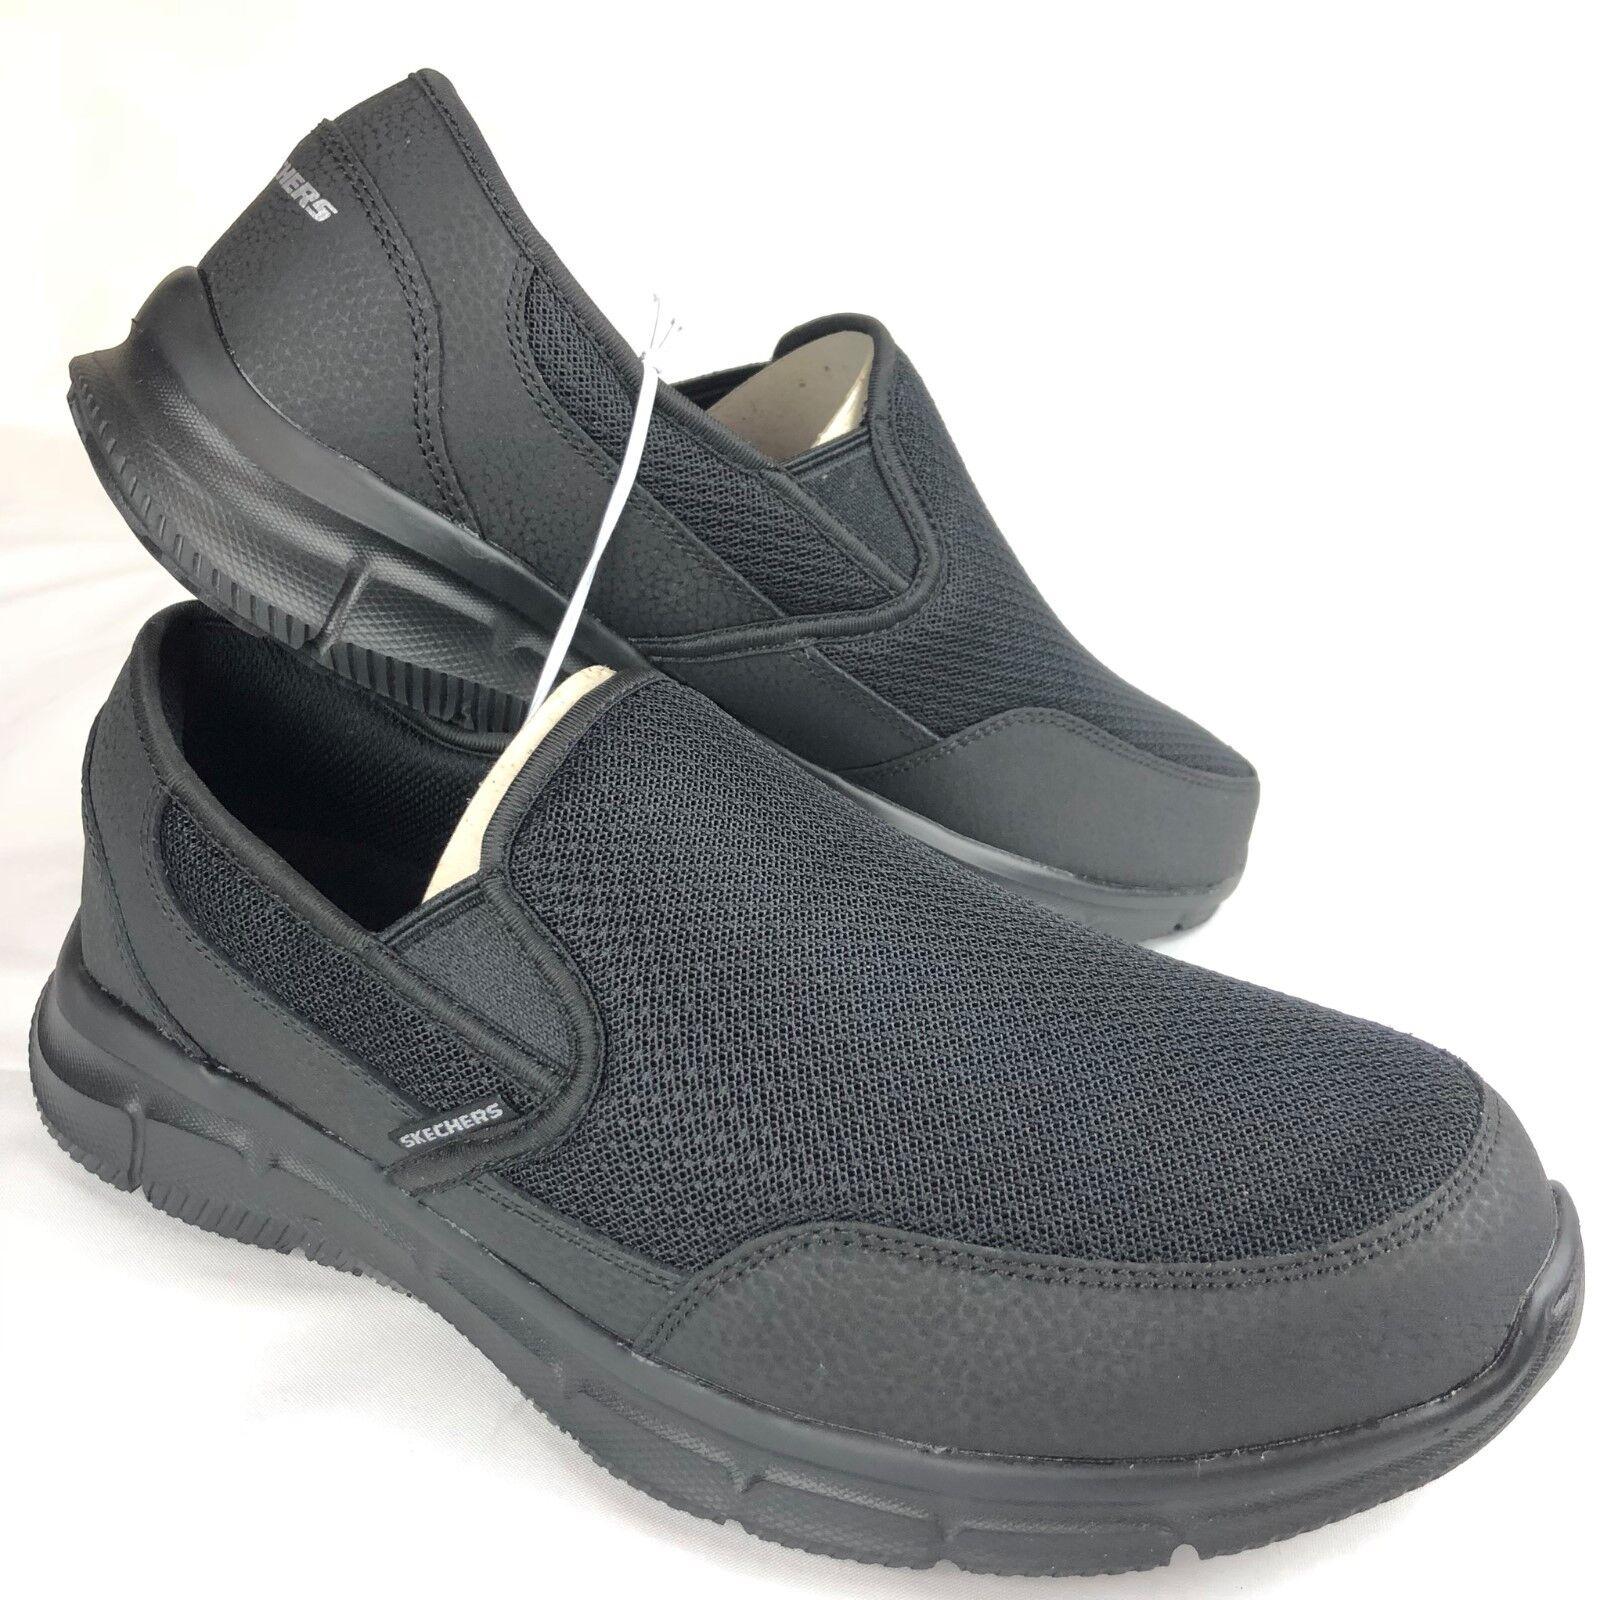 Skechers Air- Cooled Memory Foam Cool Calm Mesh Mesh Mesh Leather Slip On schuhe 9.5 10 10. 93b77e